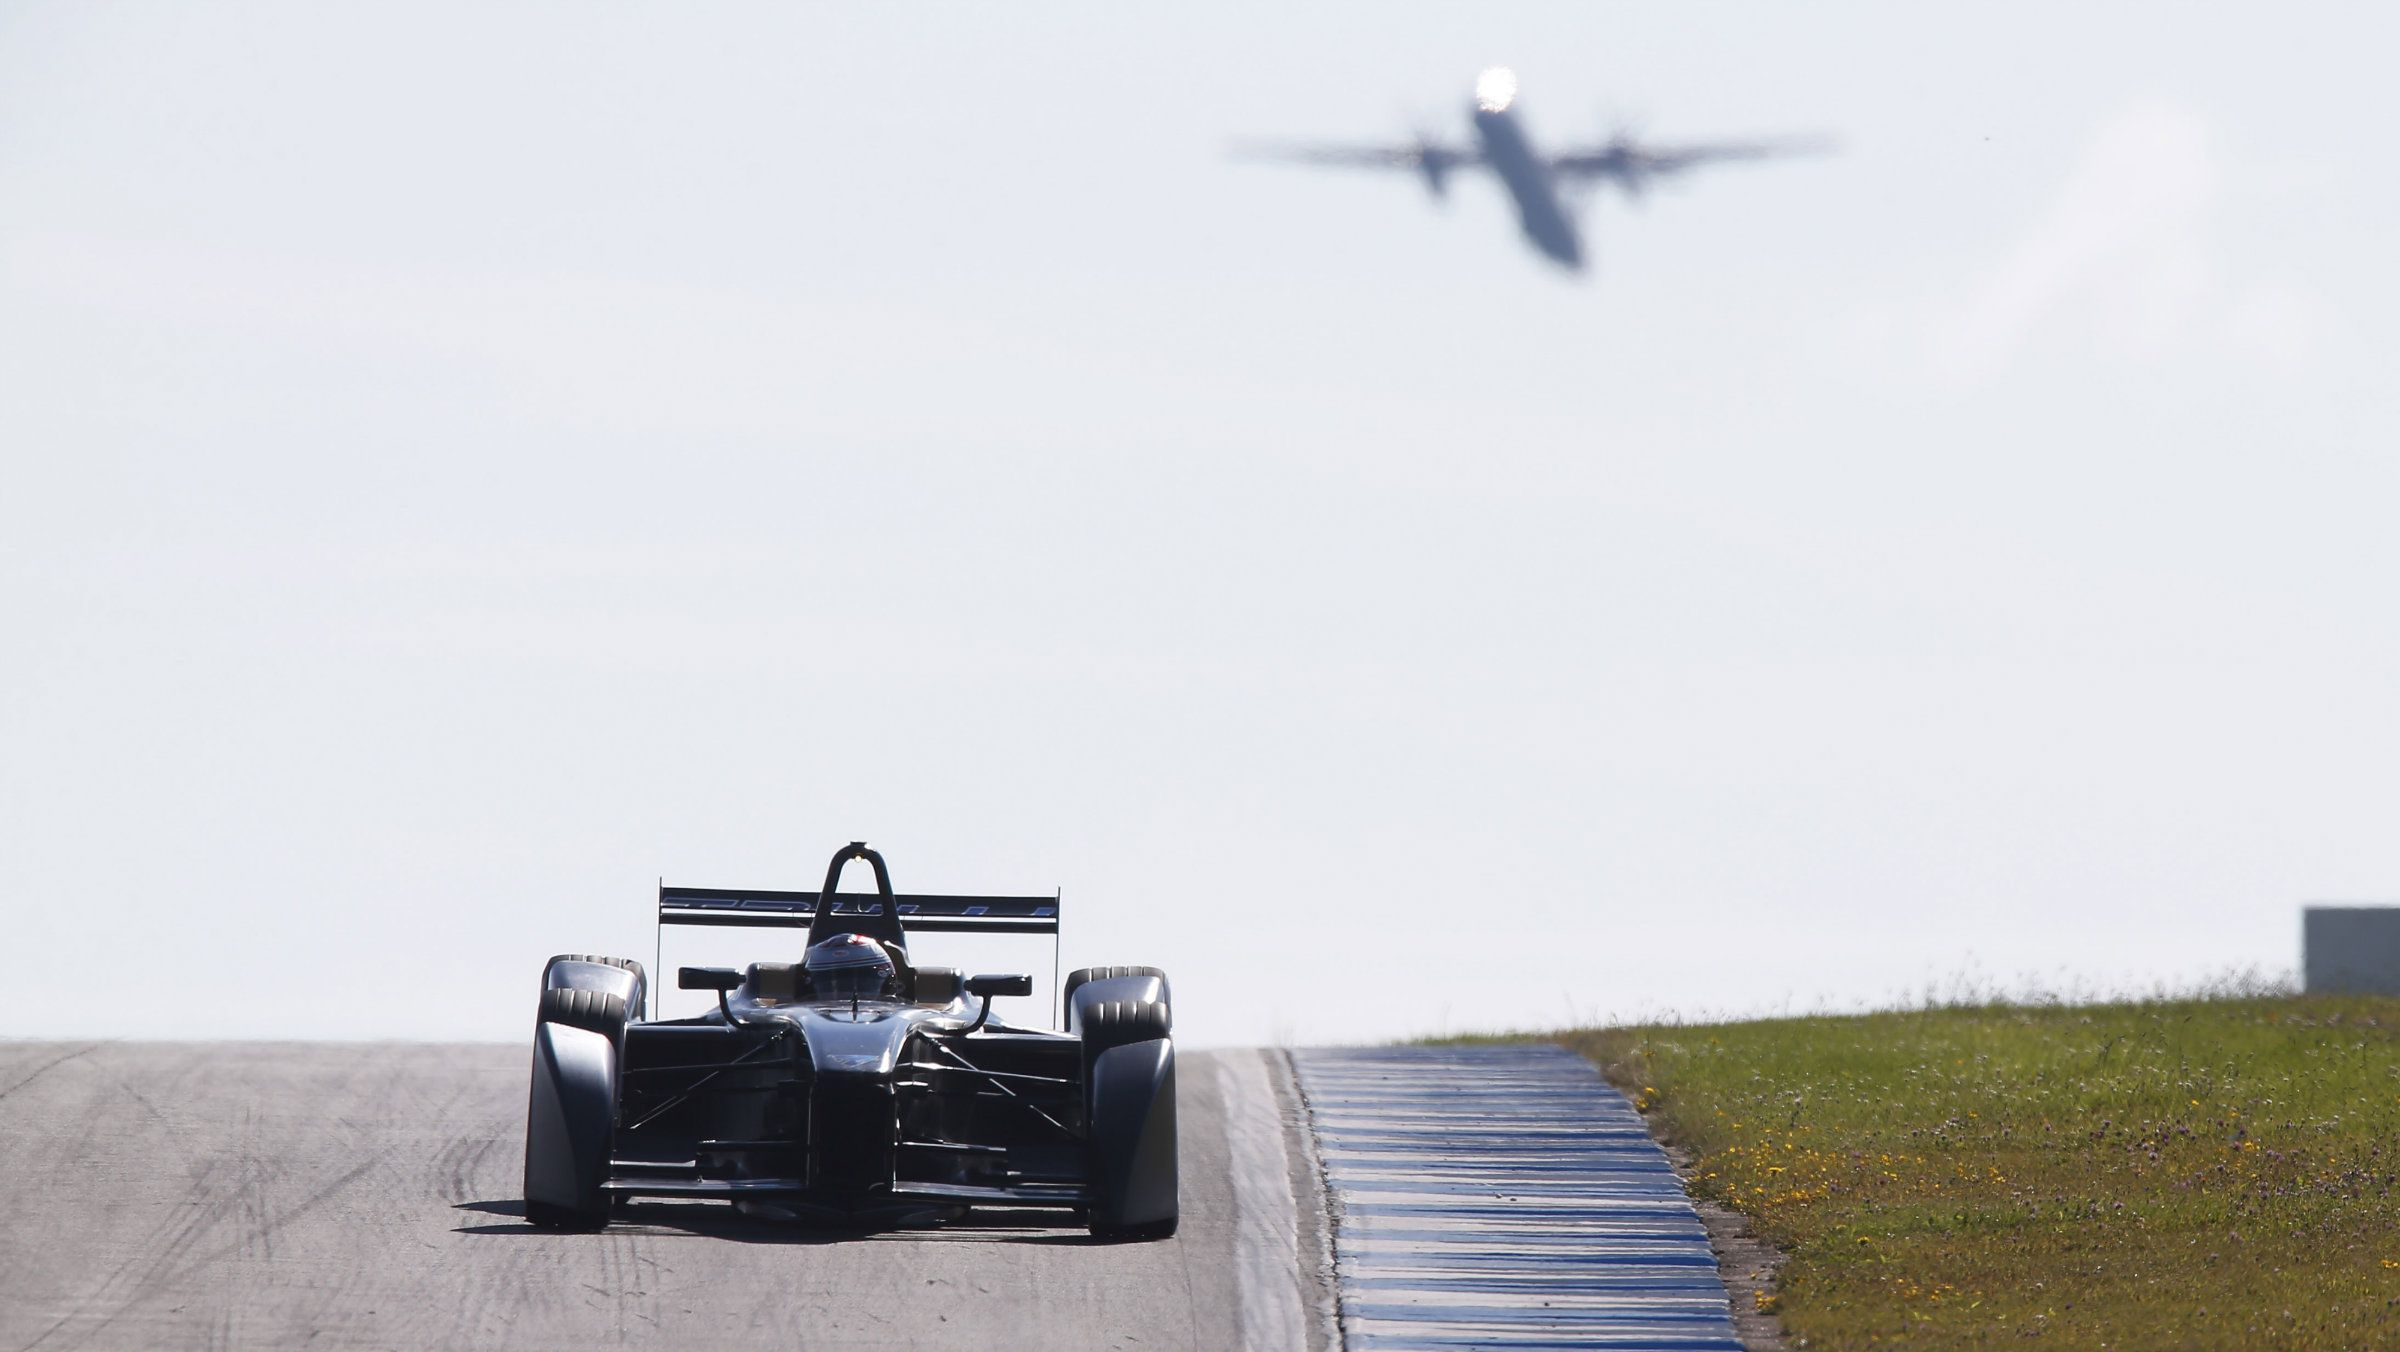 A Formula E car on the Donington Park circuit in Britain.